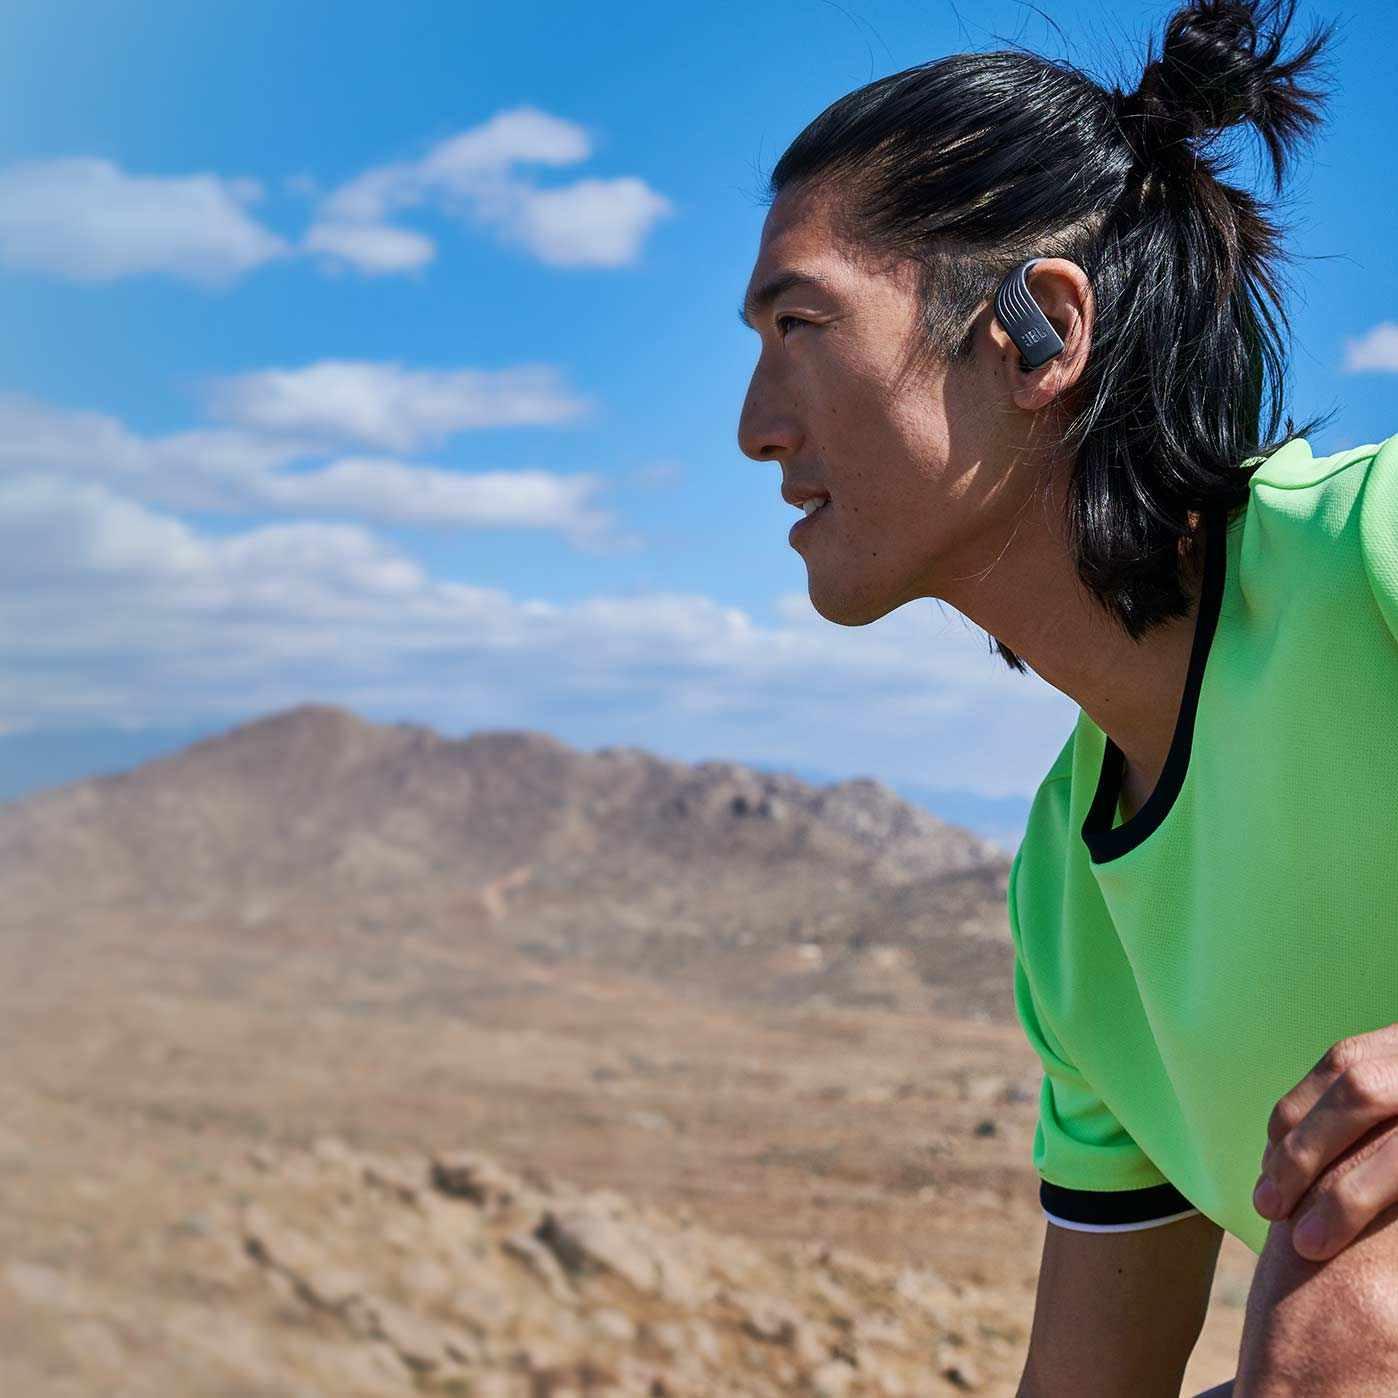 Fone de Ouvido Bluetooth JBL Endurance Peak - Preto JBLENDURPEAKBLK